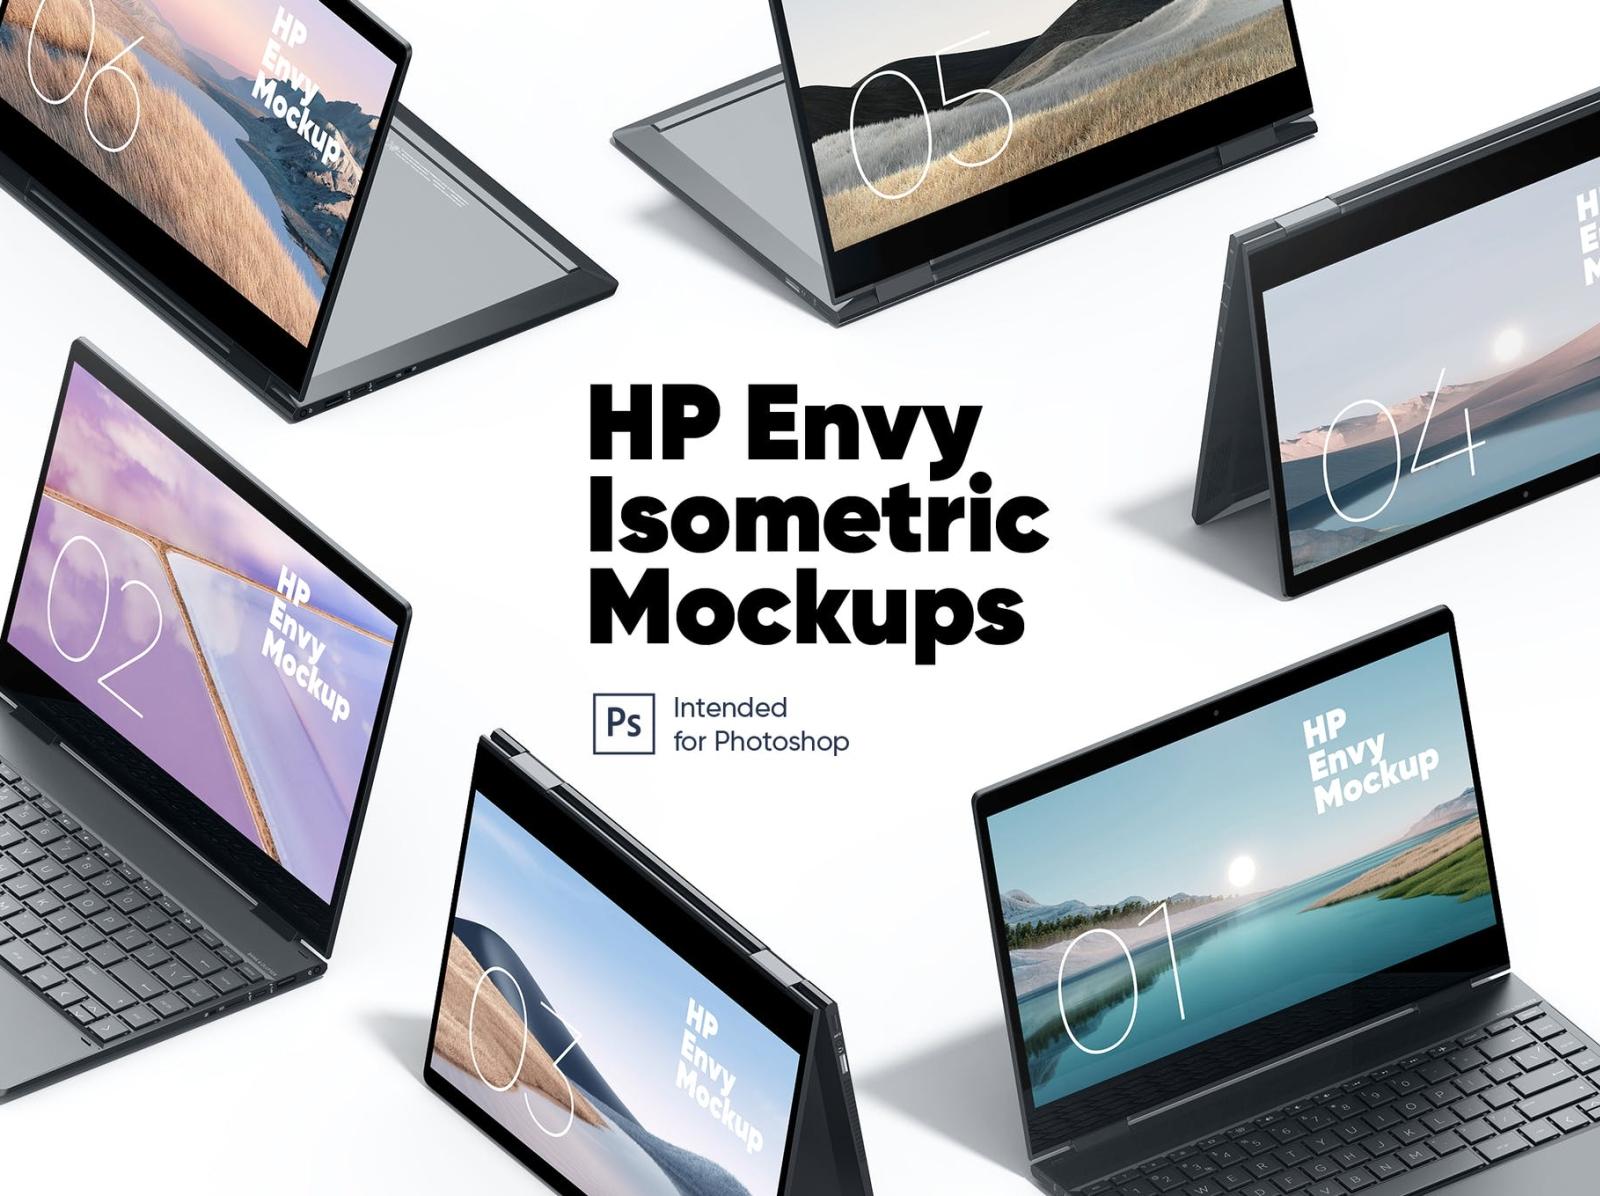 HP Envy Isometric Mockup laptop mockup laptop mockup screen mockup hp envy typography ux vector ui logo 3d illustration graphic design design branding